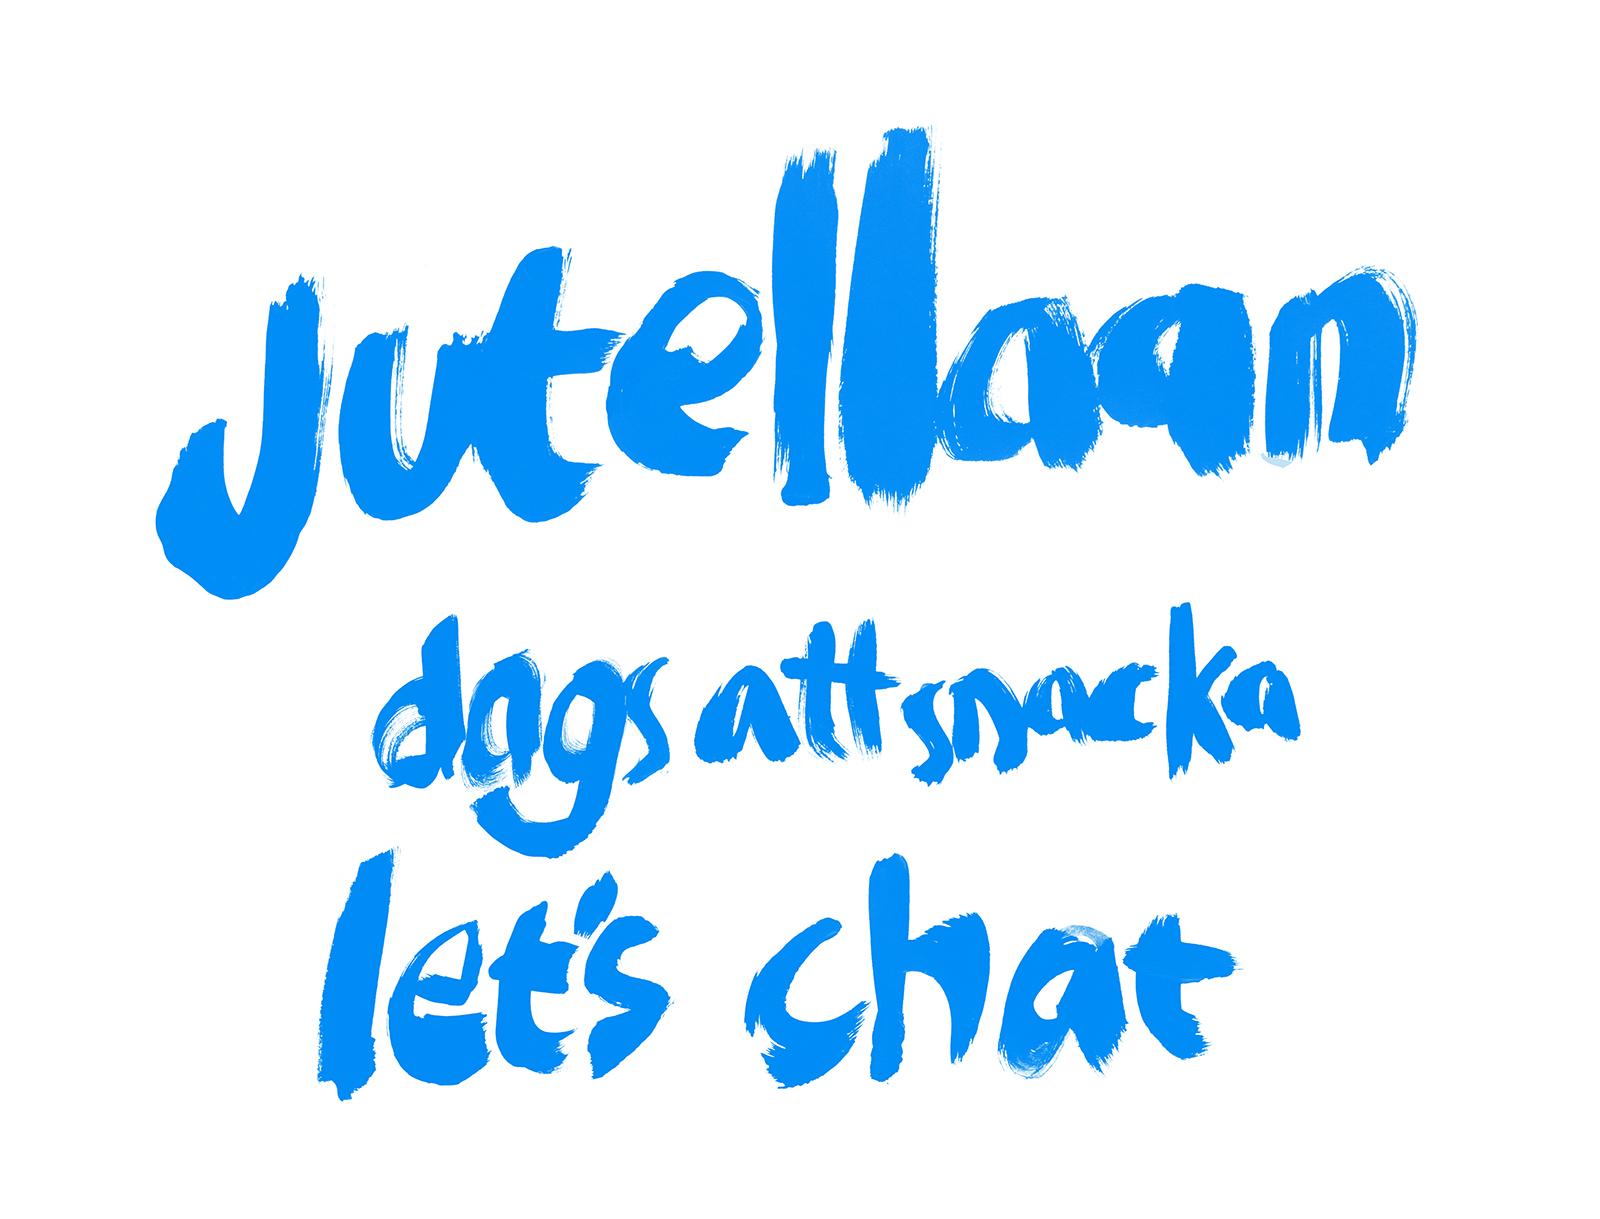 YTHS_design_juttupoyta_typography